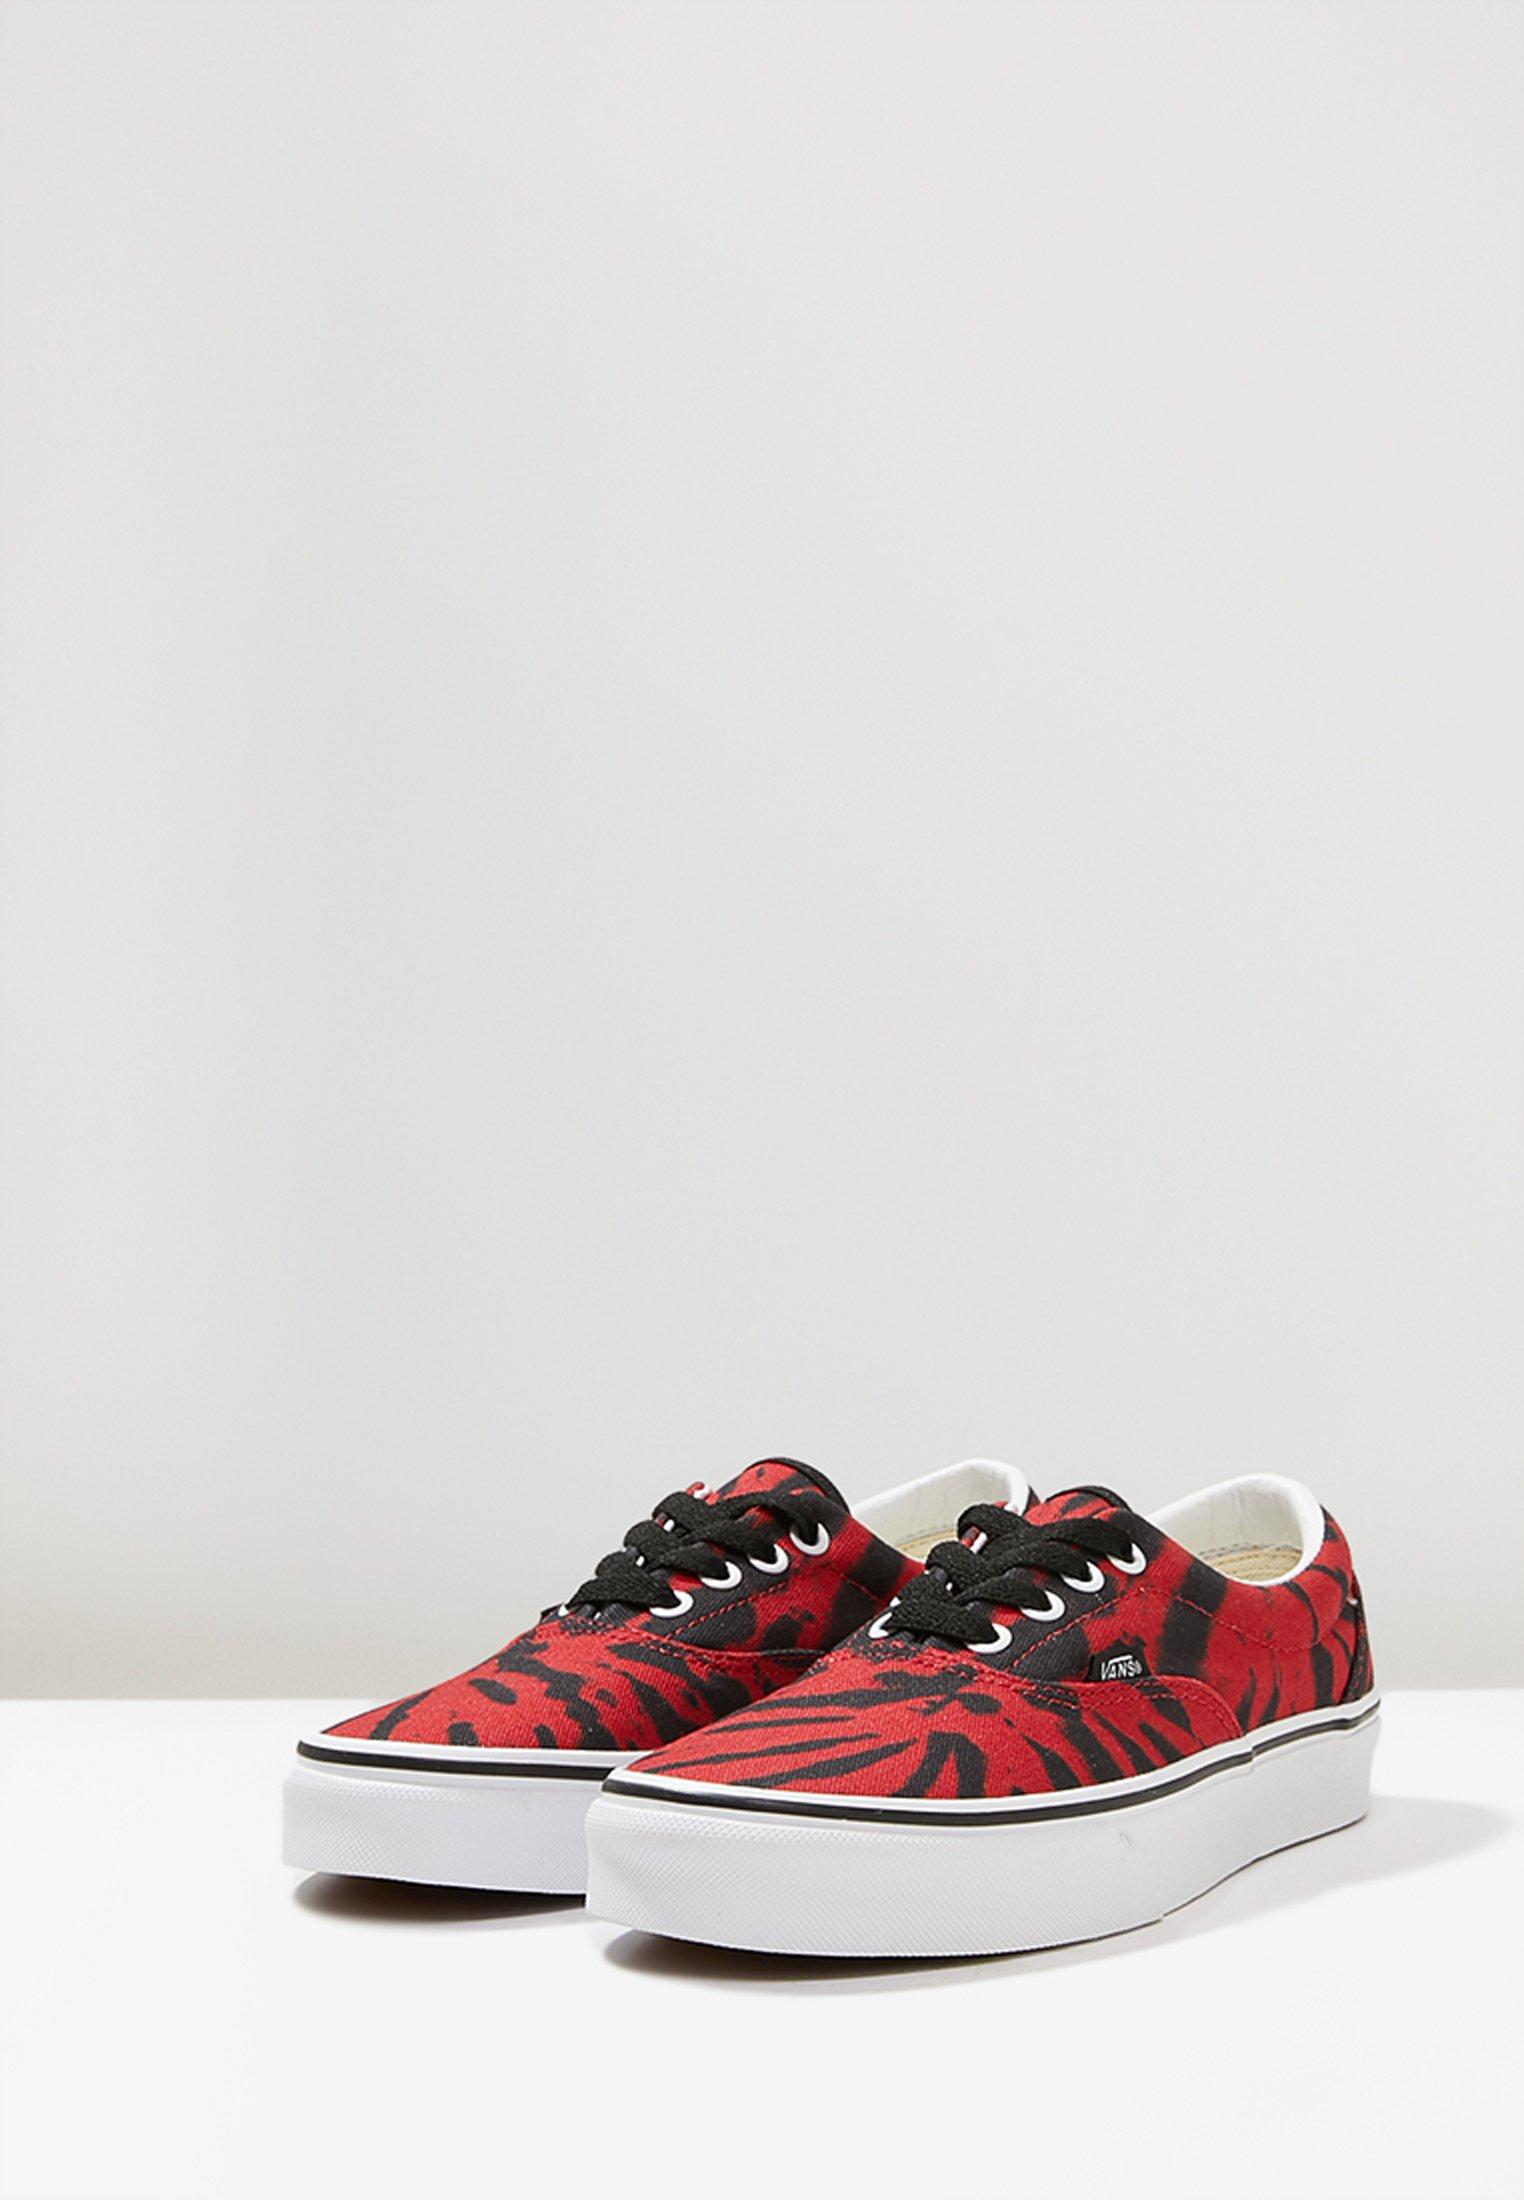 UA ERA TIE DYE Chaussures de skate tango redtrue white